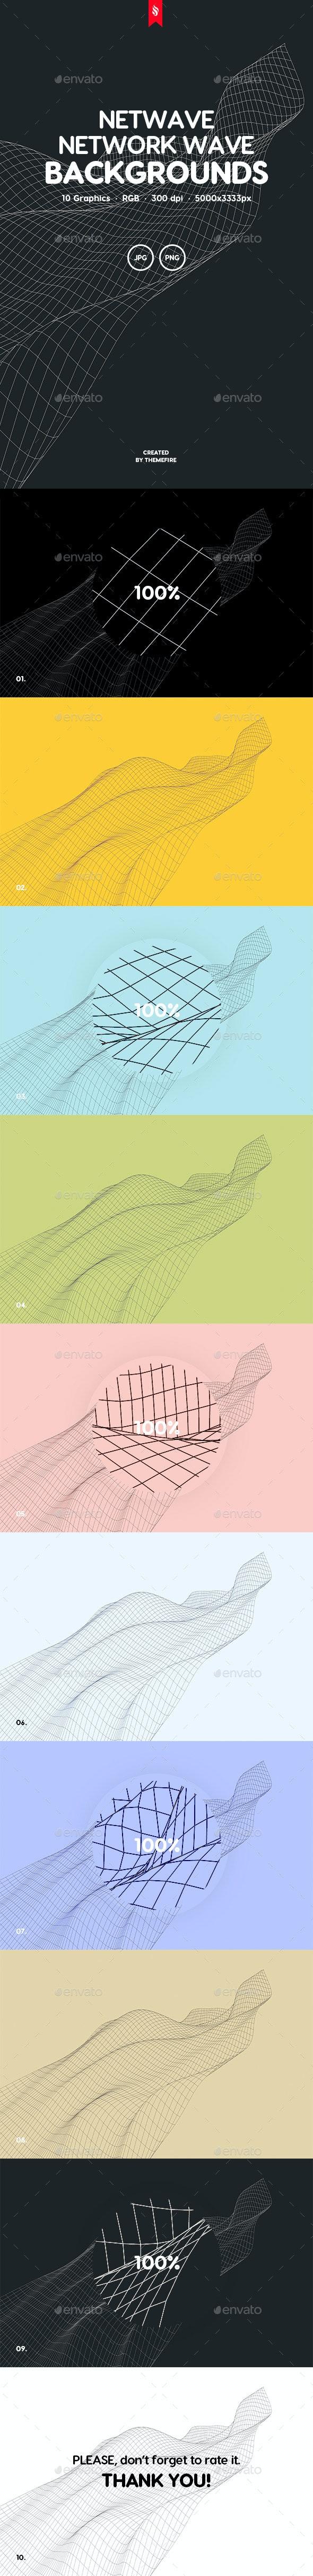 Netwave - Smooth Network Wave Background - 3D Backgrounds